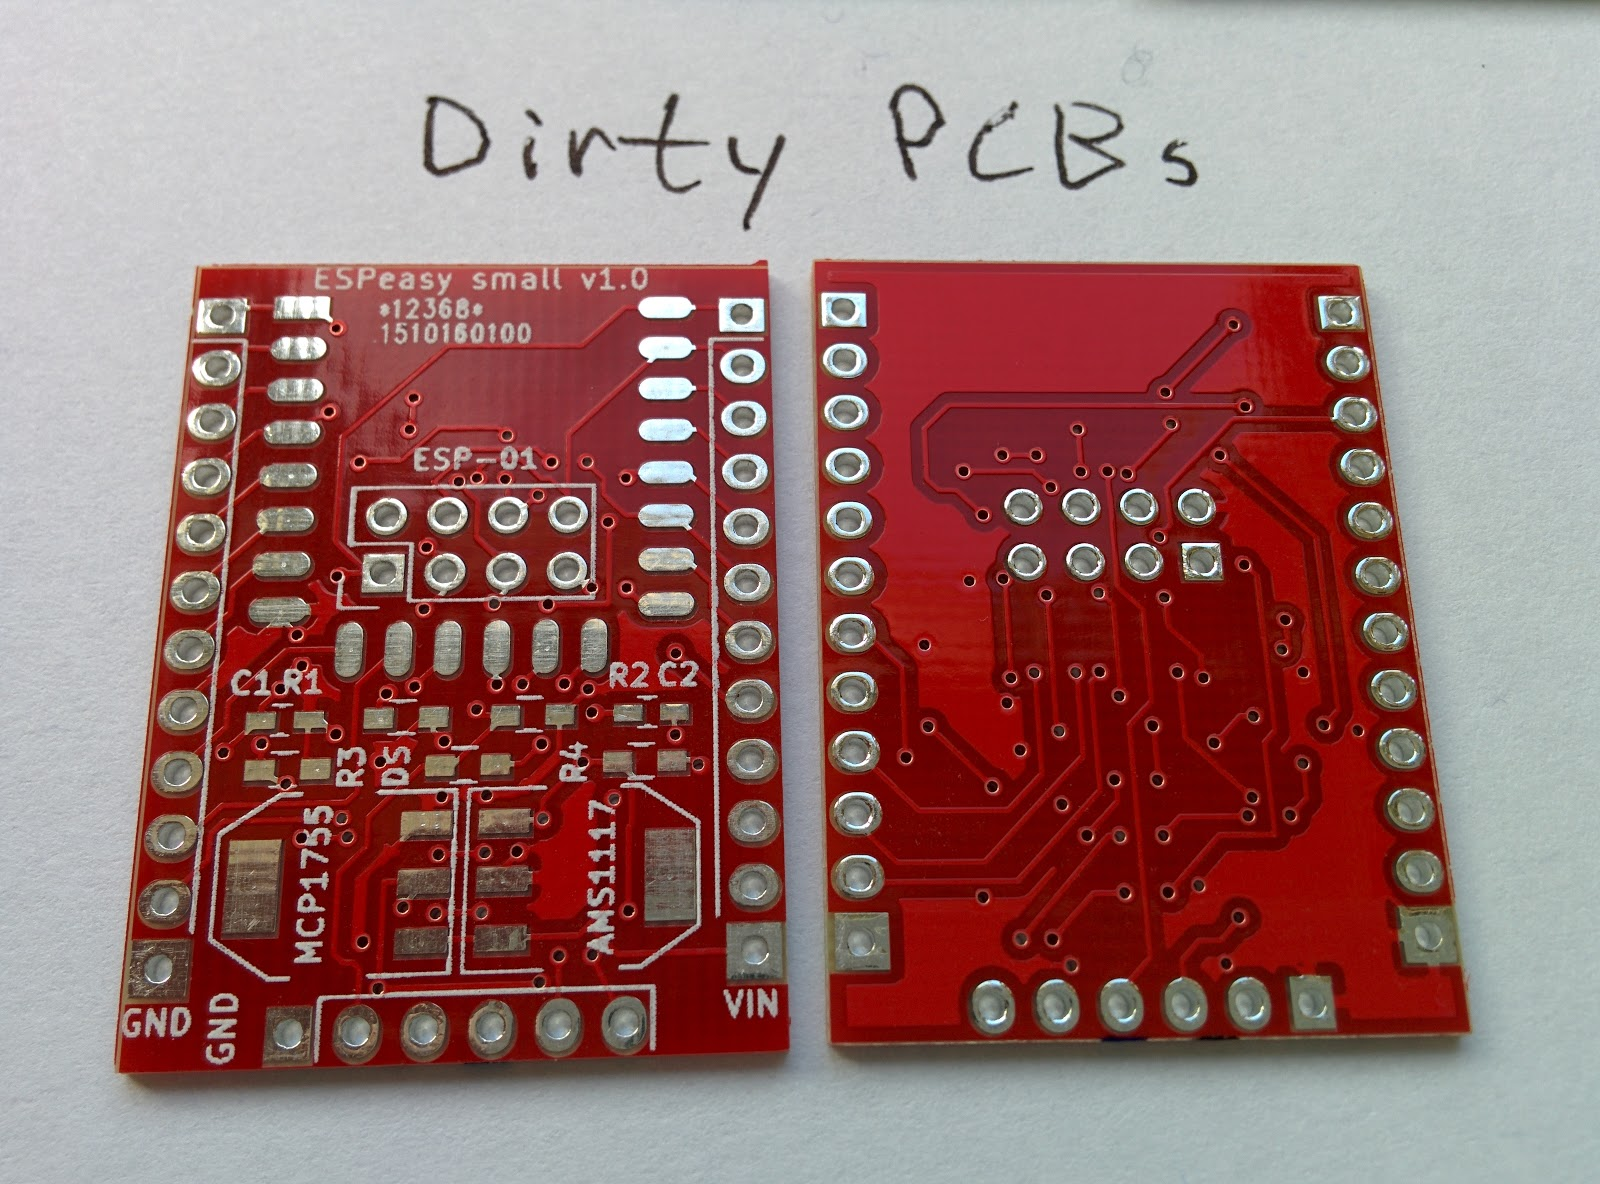 englund: Comparison of cheap PCB manufacturers